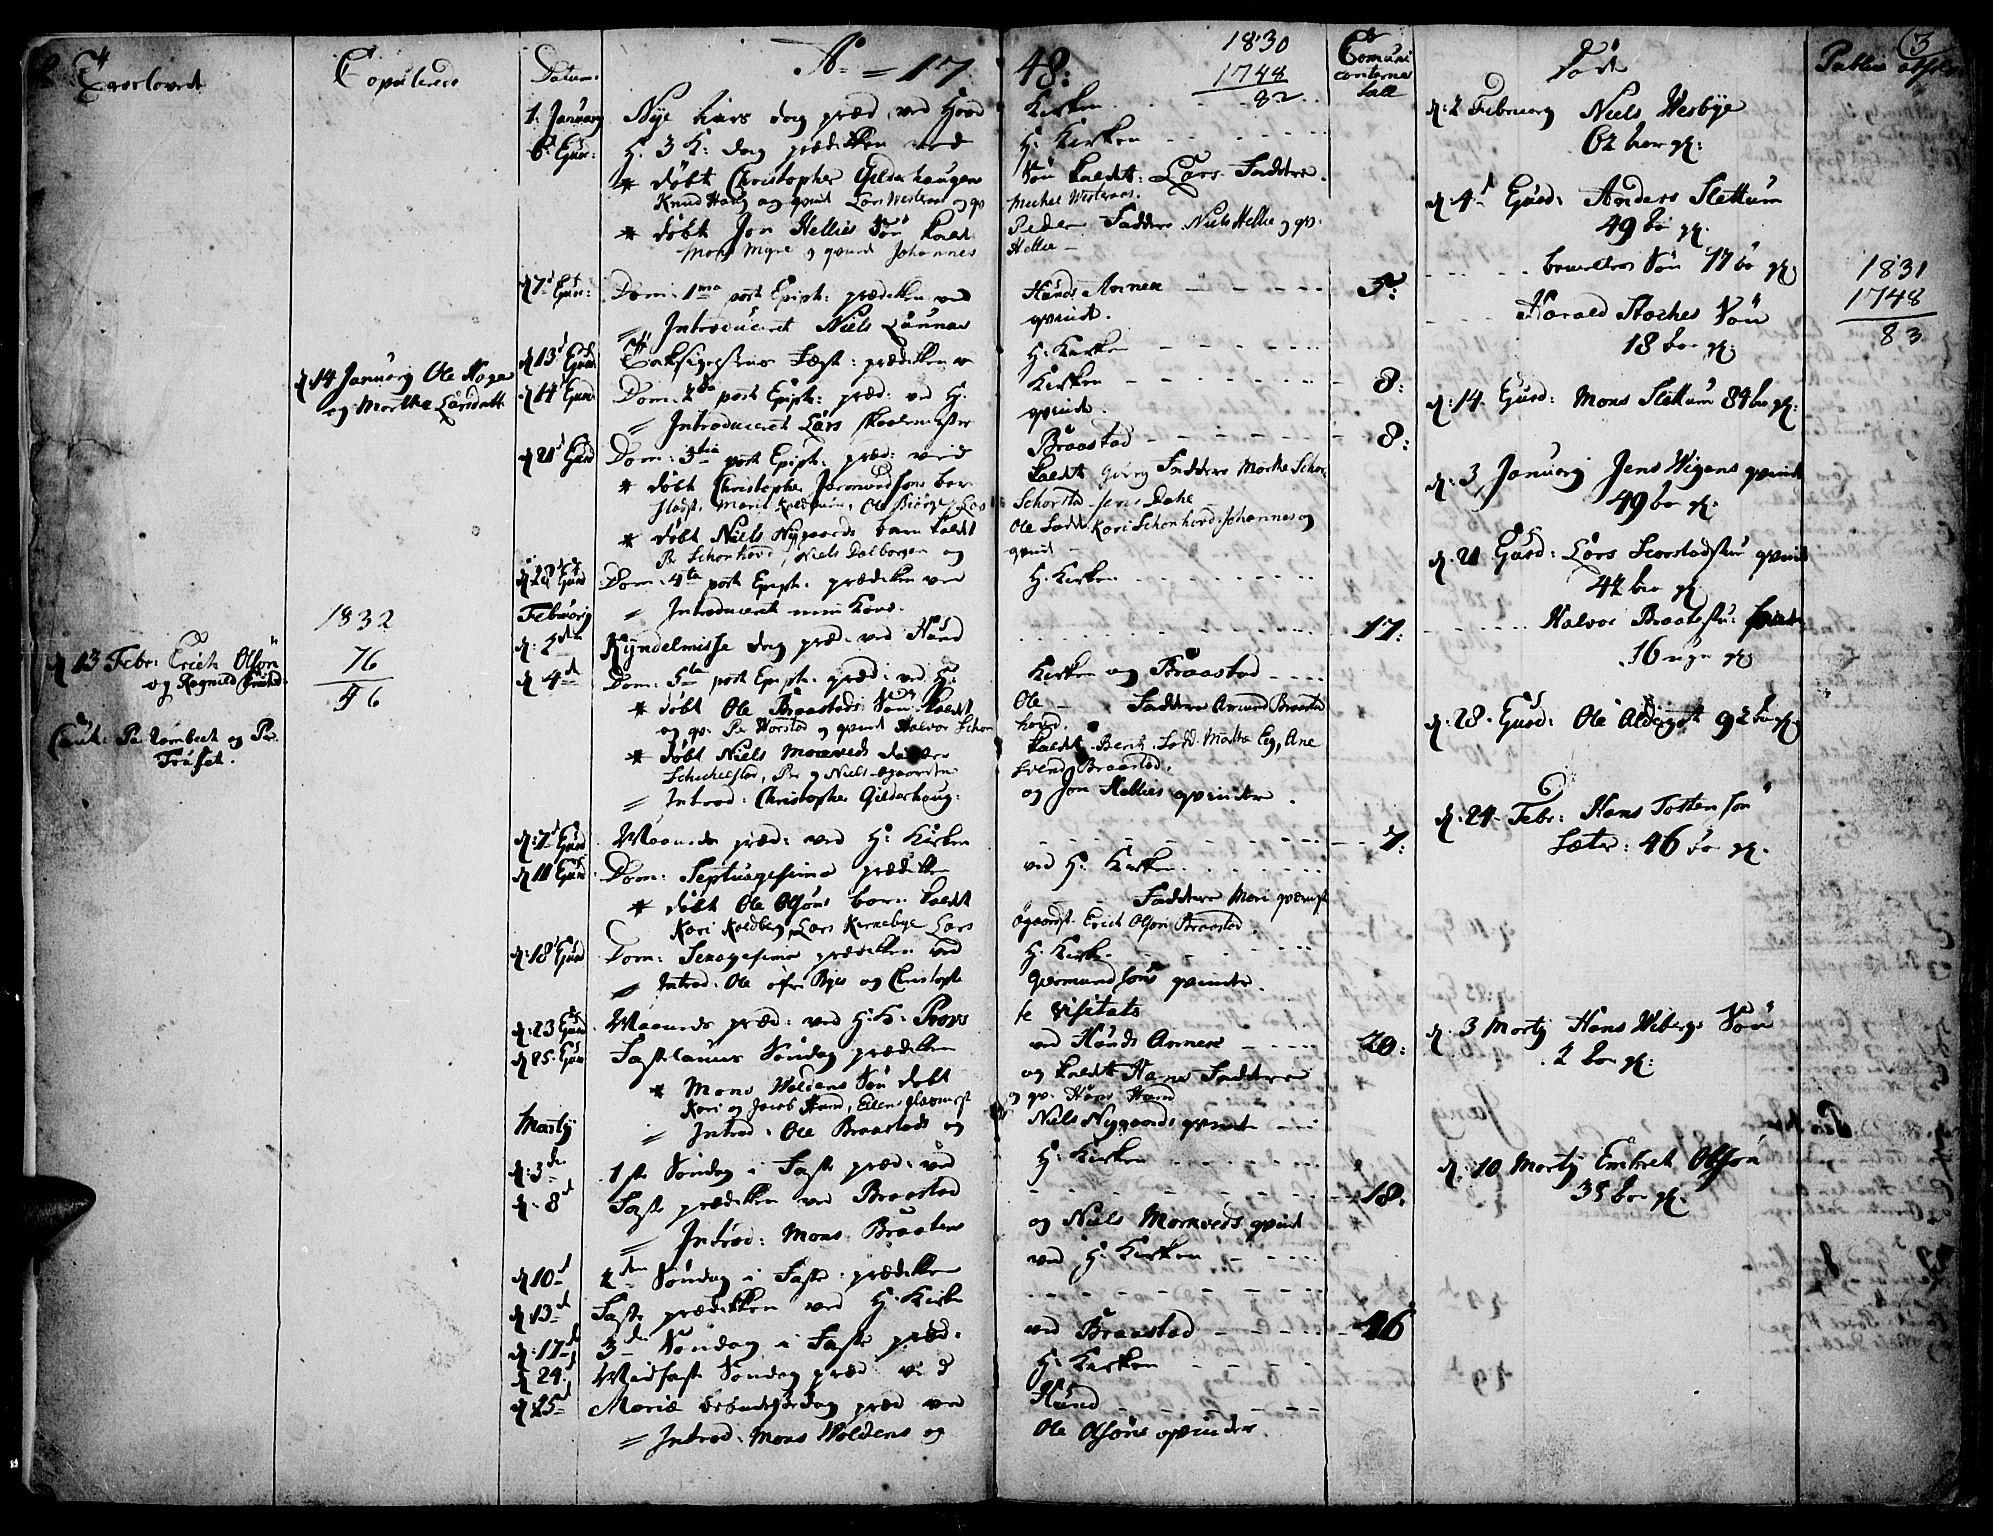 SAH, Vardal prestekontor, H/Ha/Haa/L0002: Ministerialbok nr. 2, 1748-1776, s. 2-3